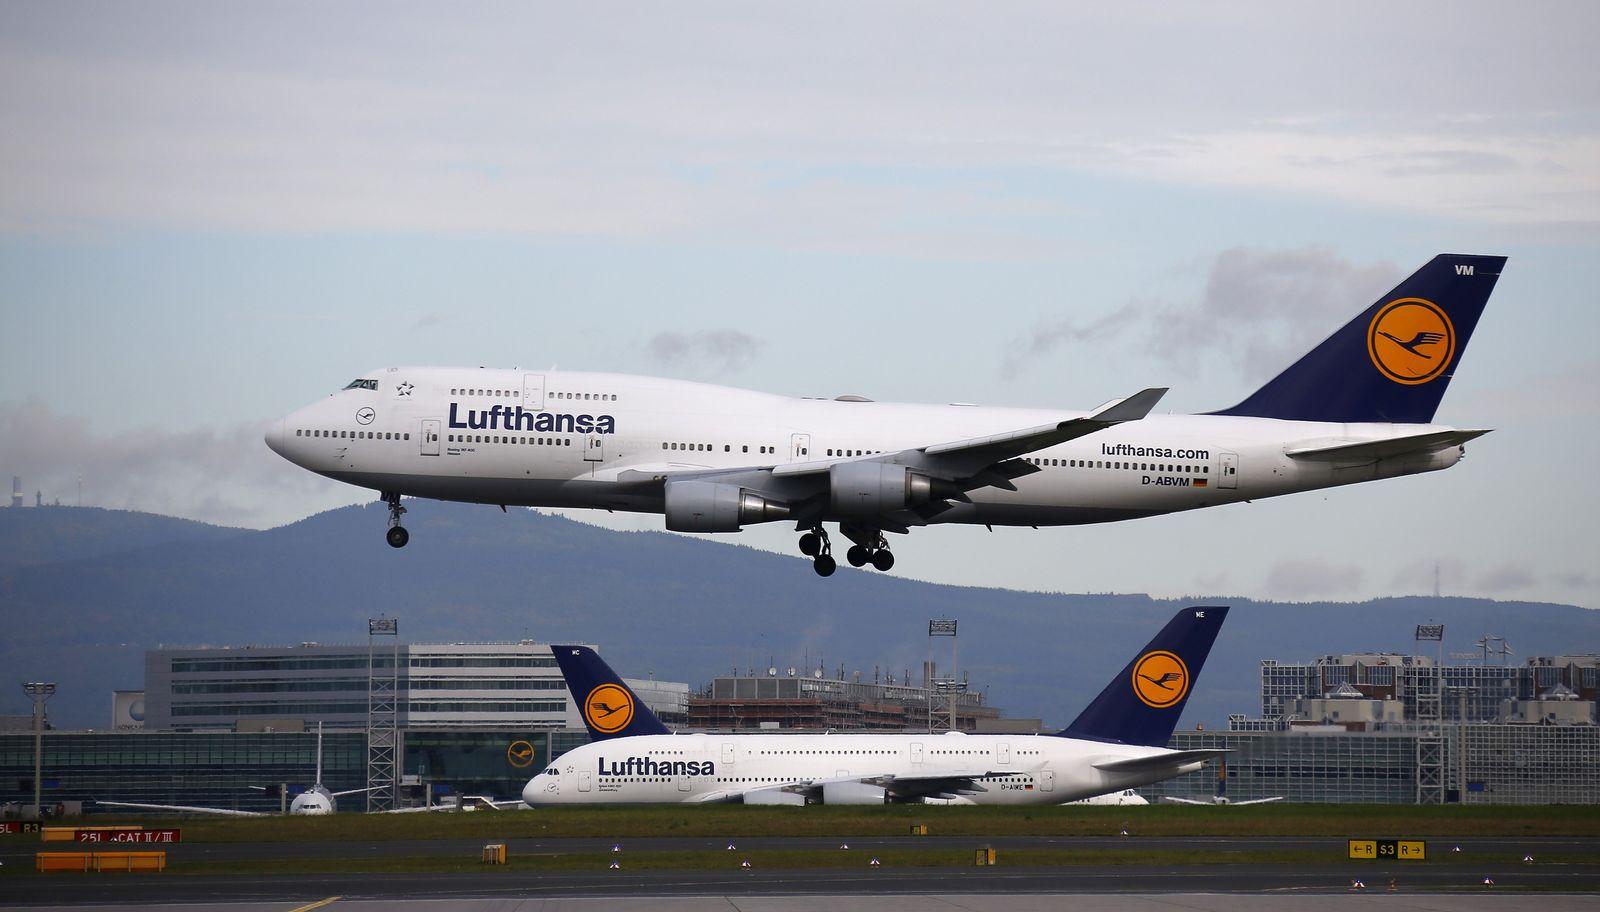 Lufthansa Frankfurt